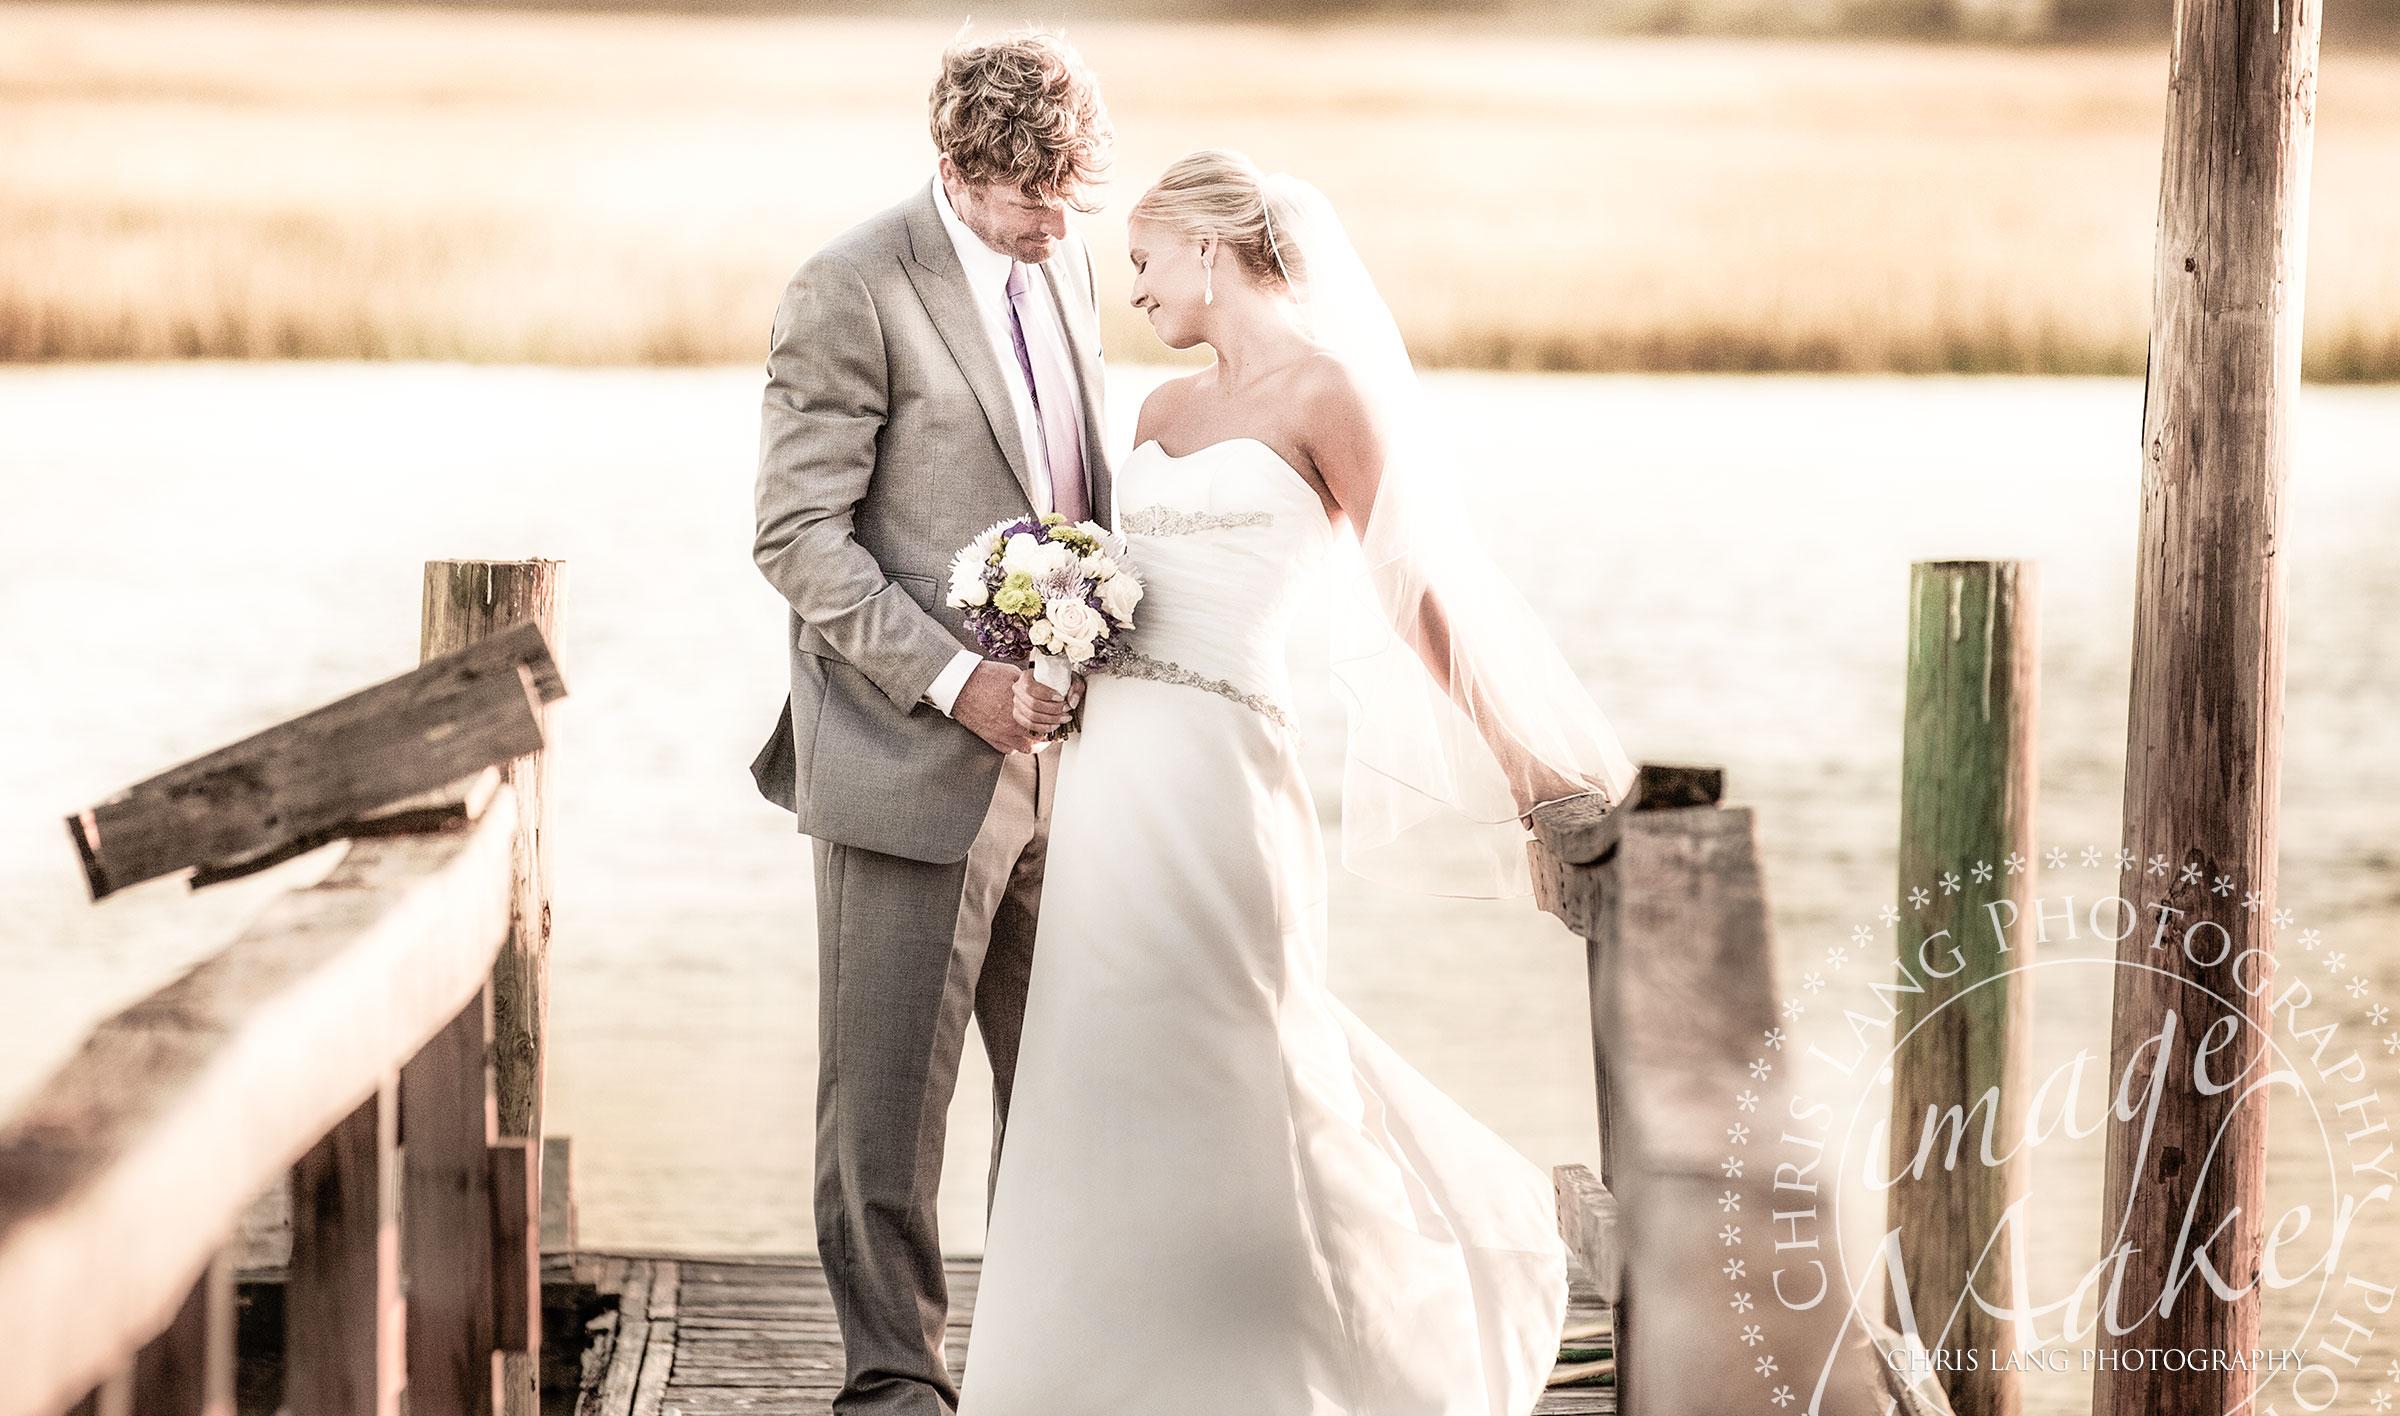 Wedding Photography Styles: Natural Light Wedding Photography